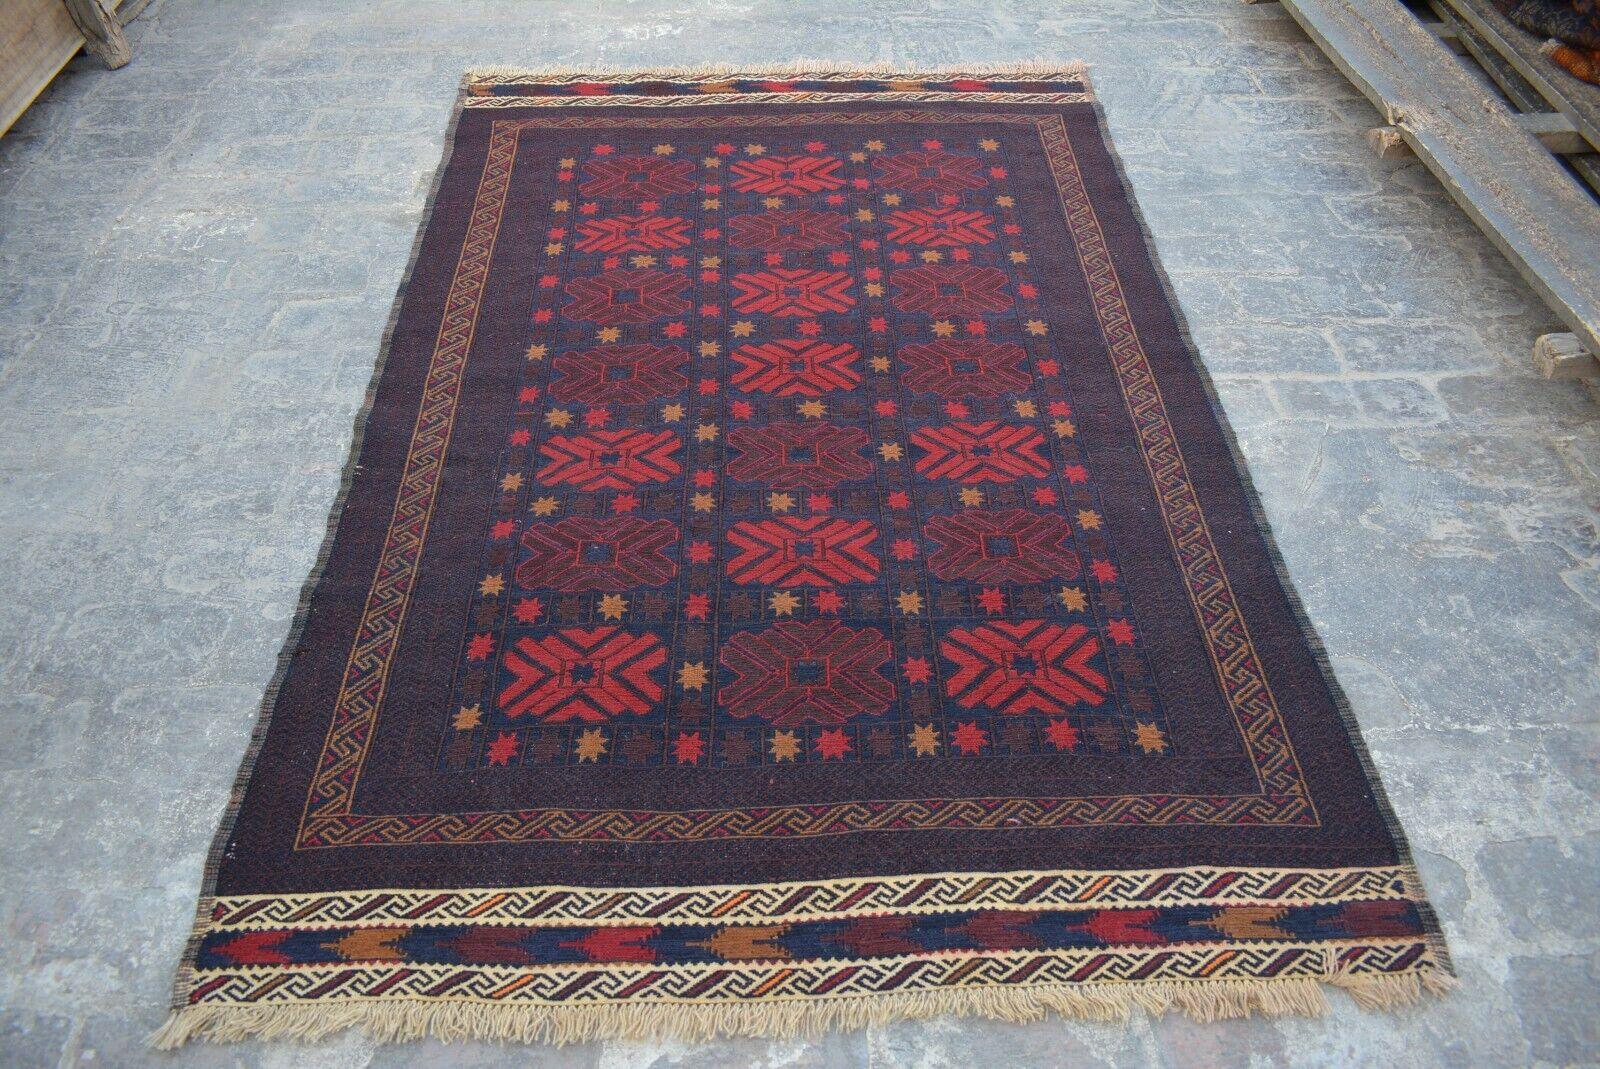 F642 Vintage Handwoven Afghan Tribal Sumik   Turkish Stunning Rug 4'4 x 6'8 Feet